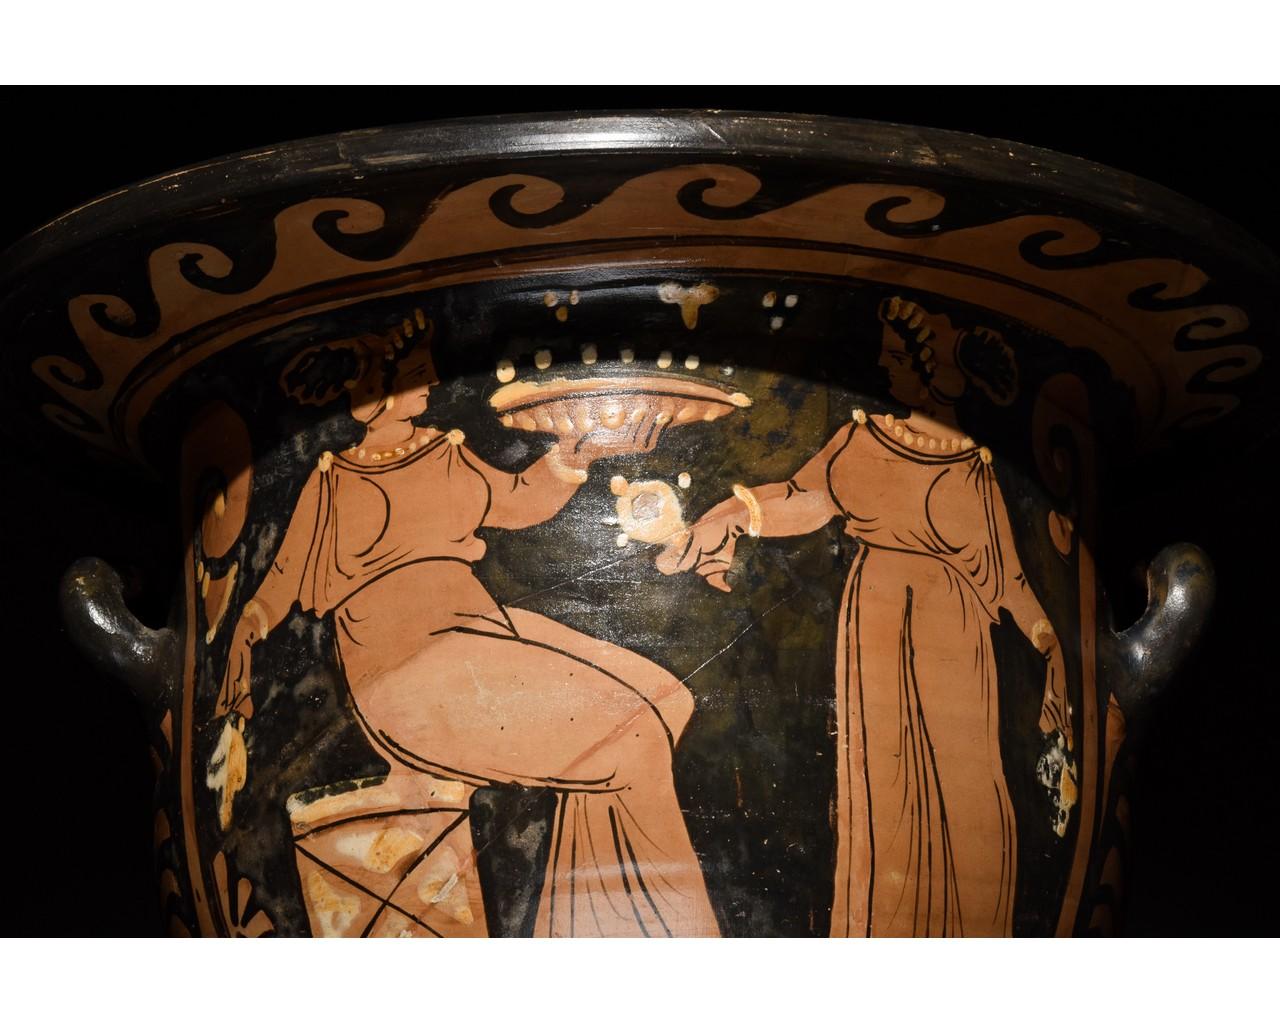 LARGE GREEK APULIAN BELL KRATER - TL TESTED - Image 10 of 15